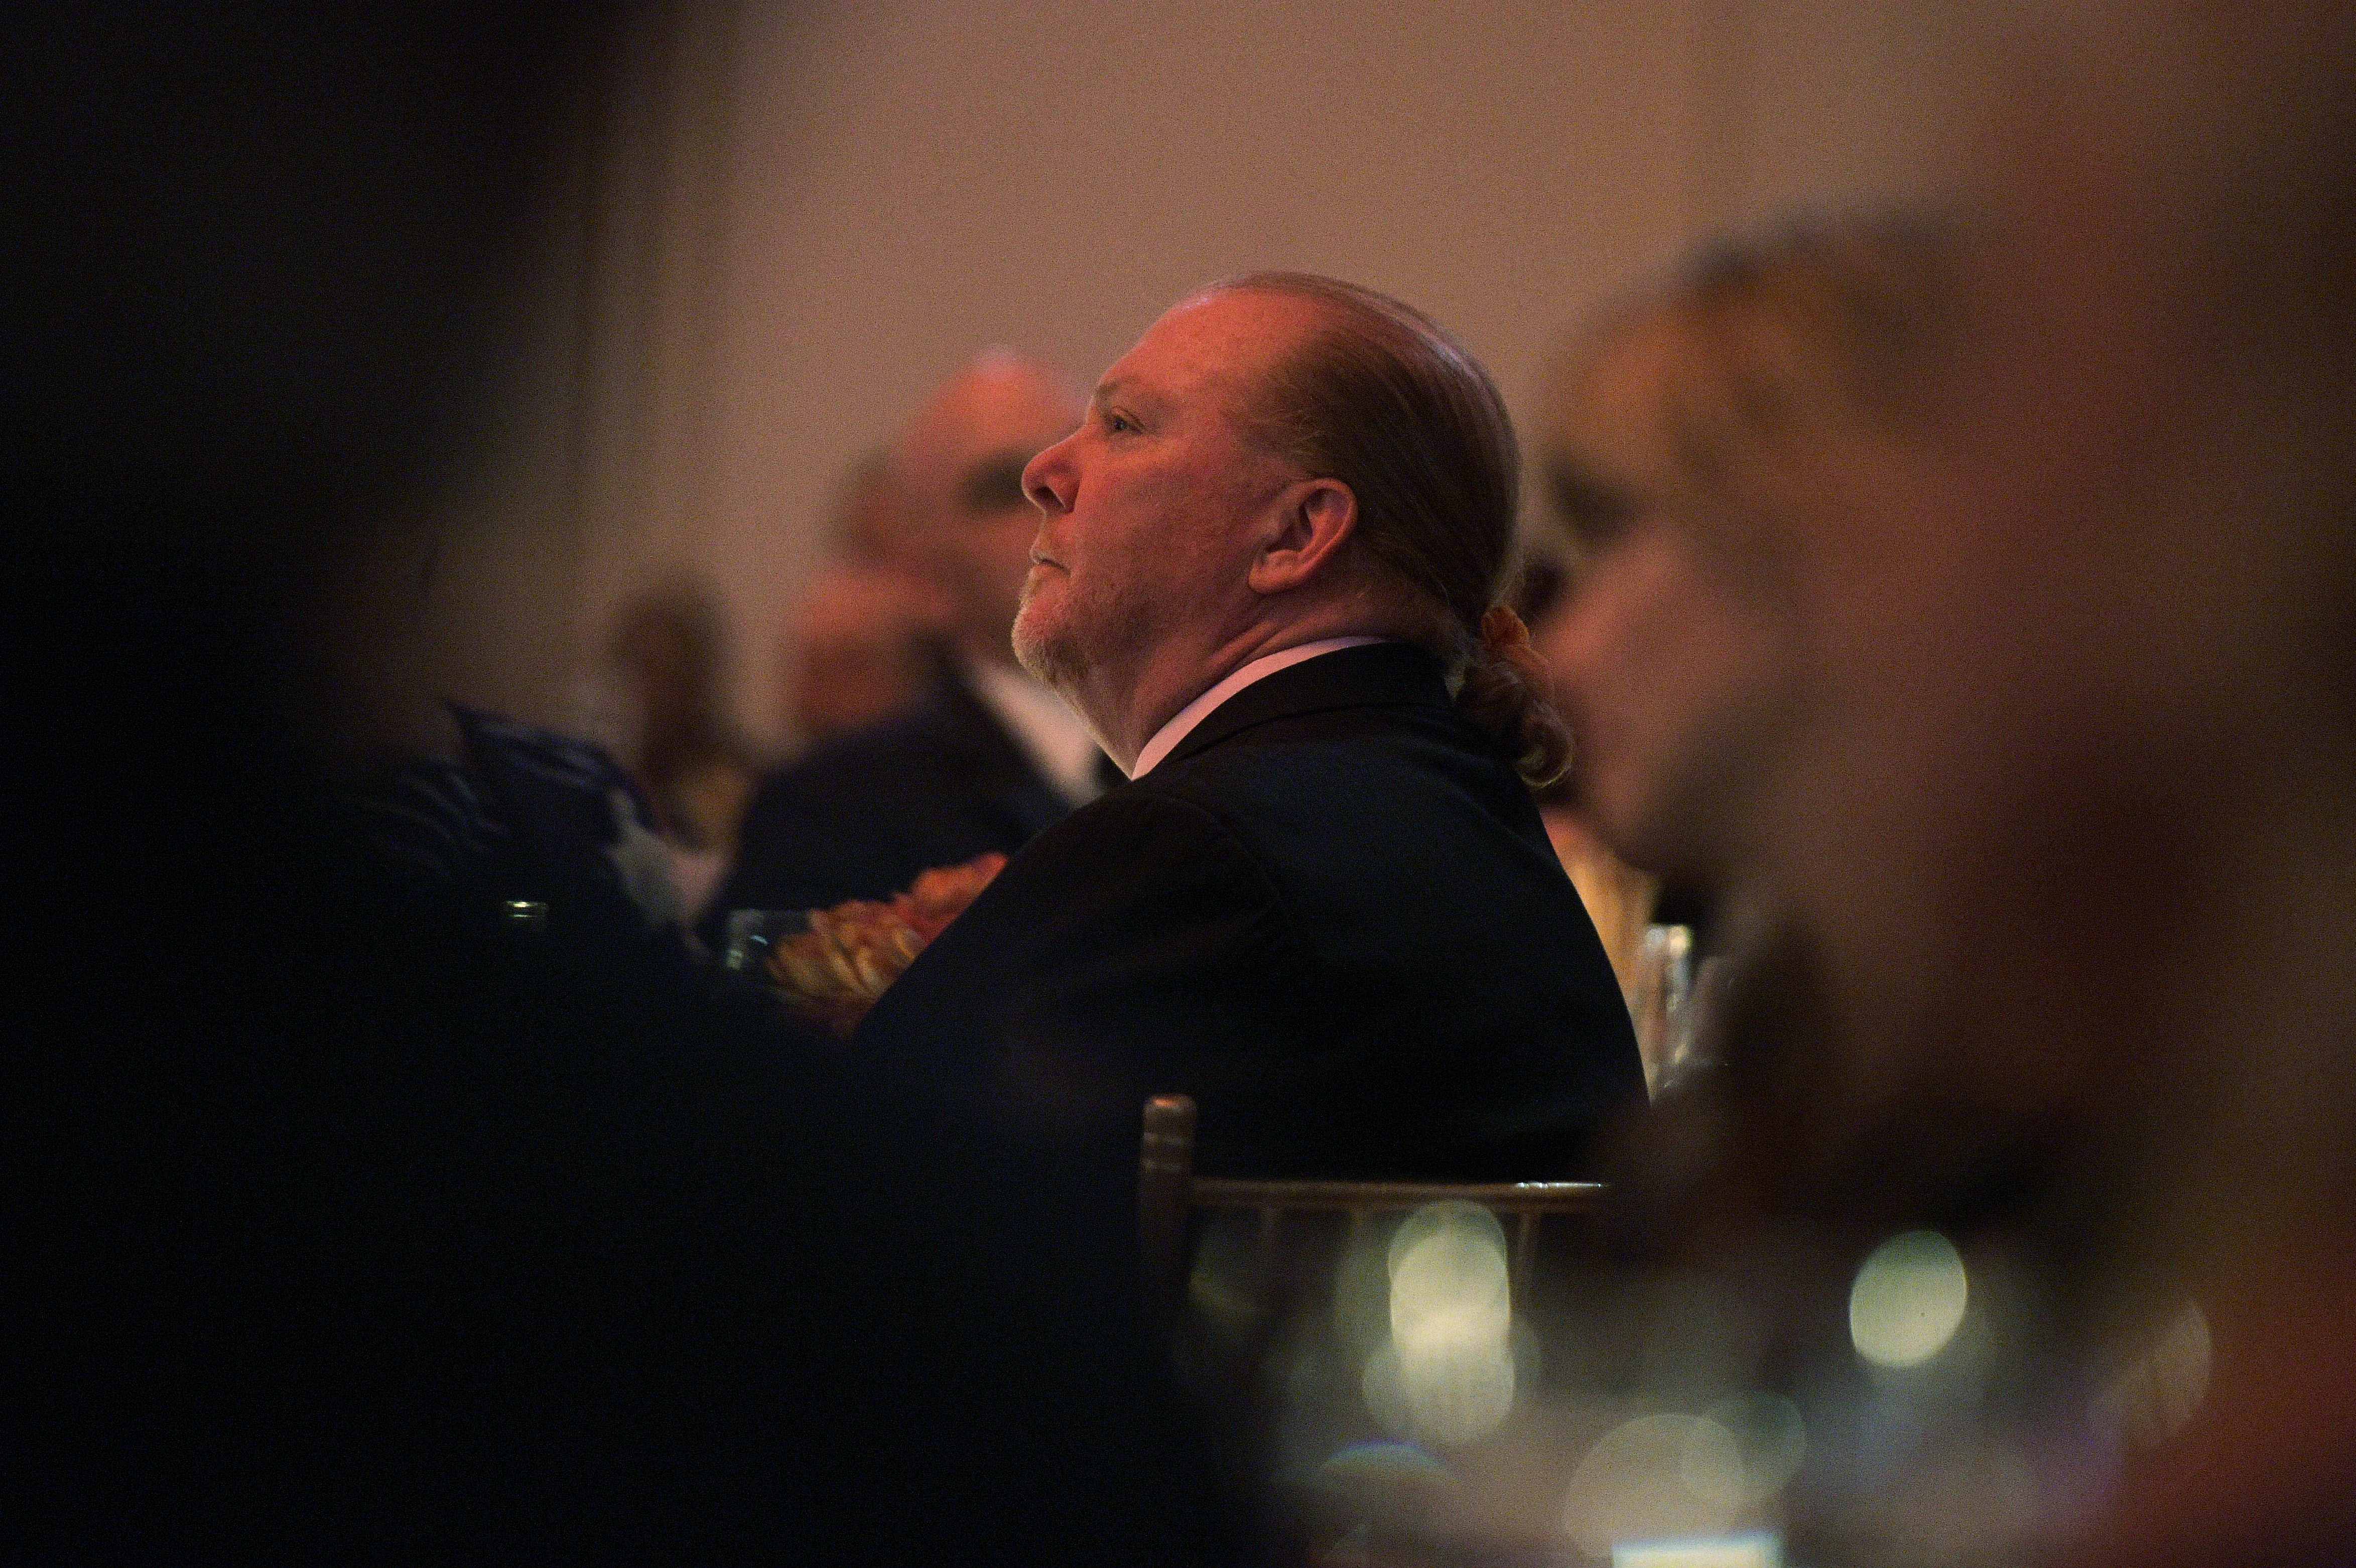 A man, Mario Batali, seated in profile